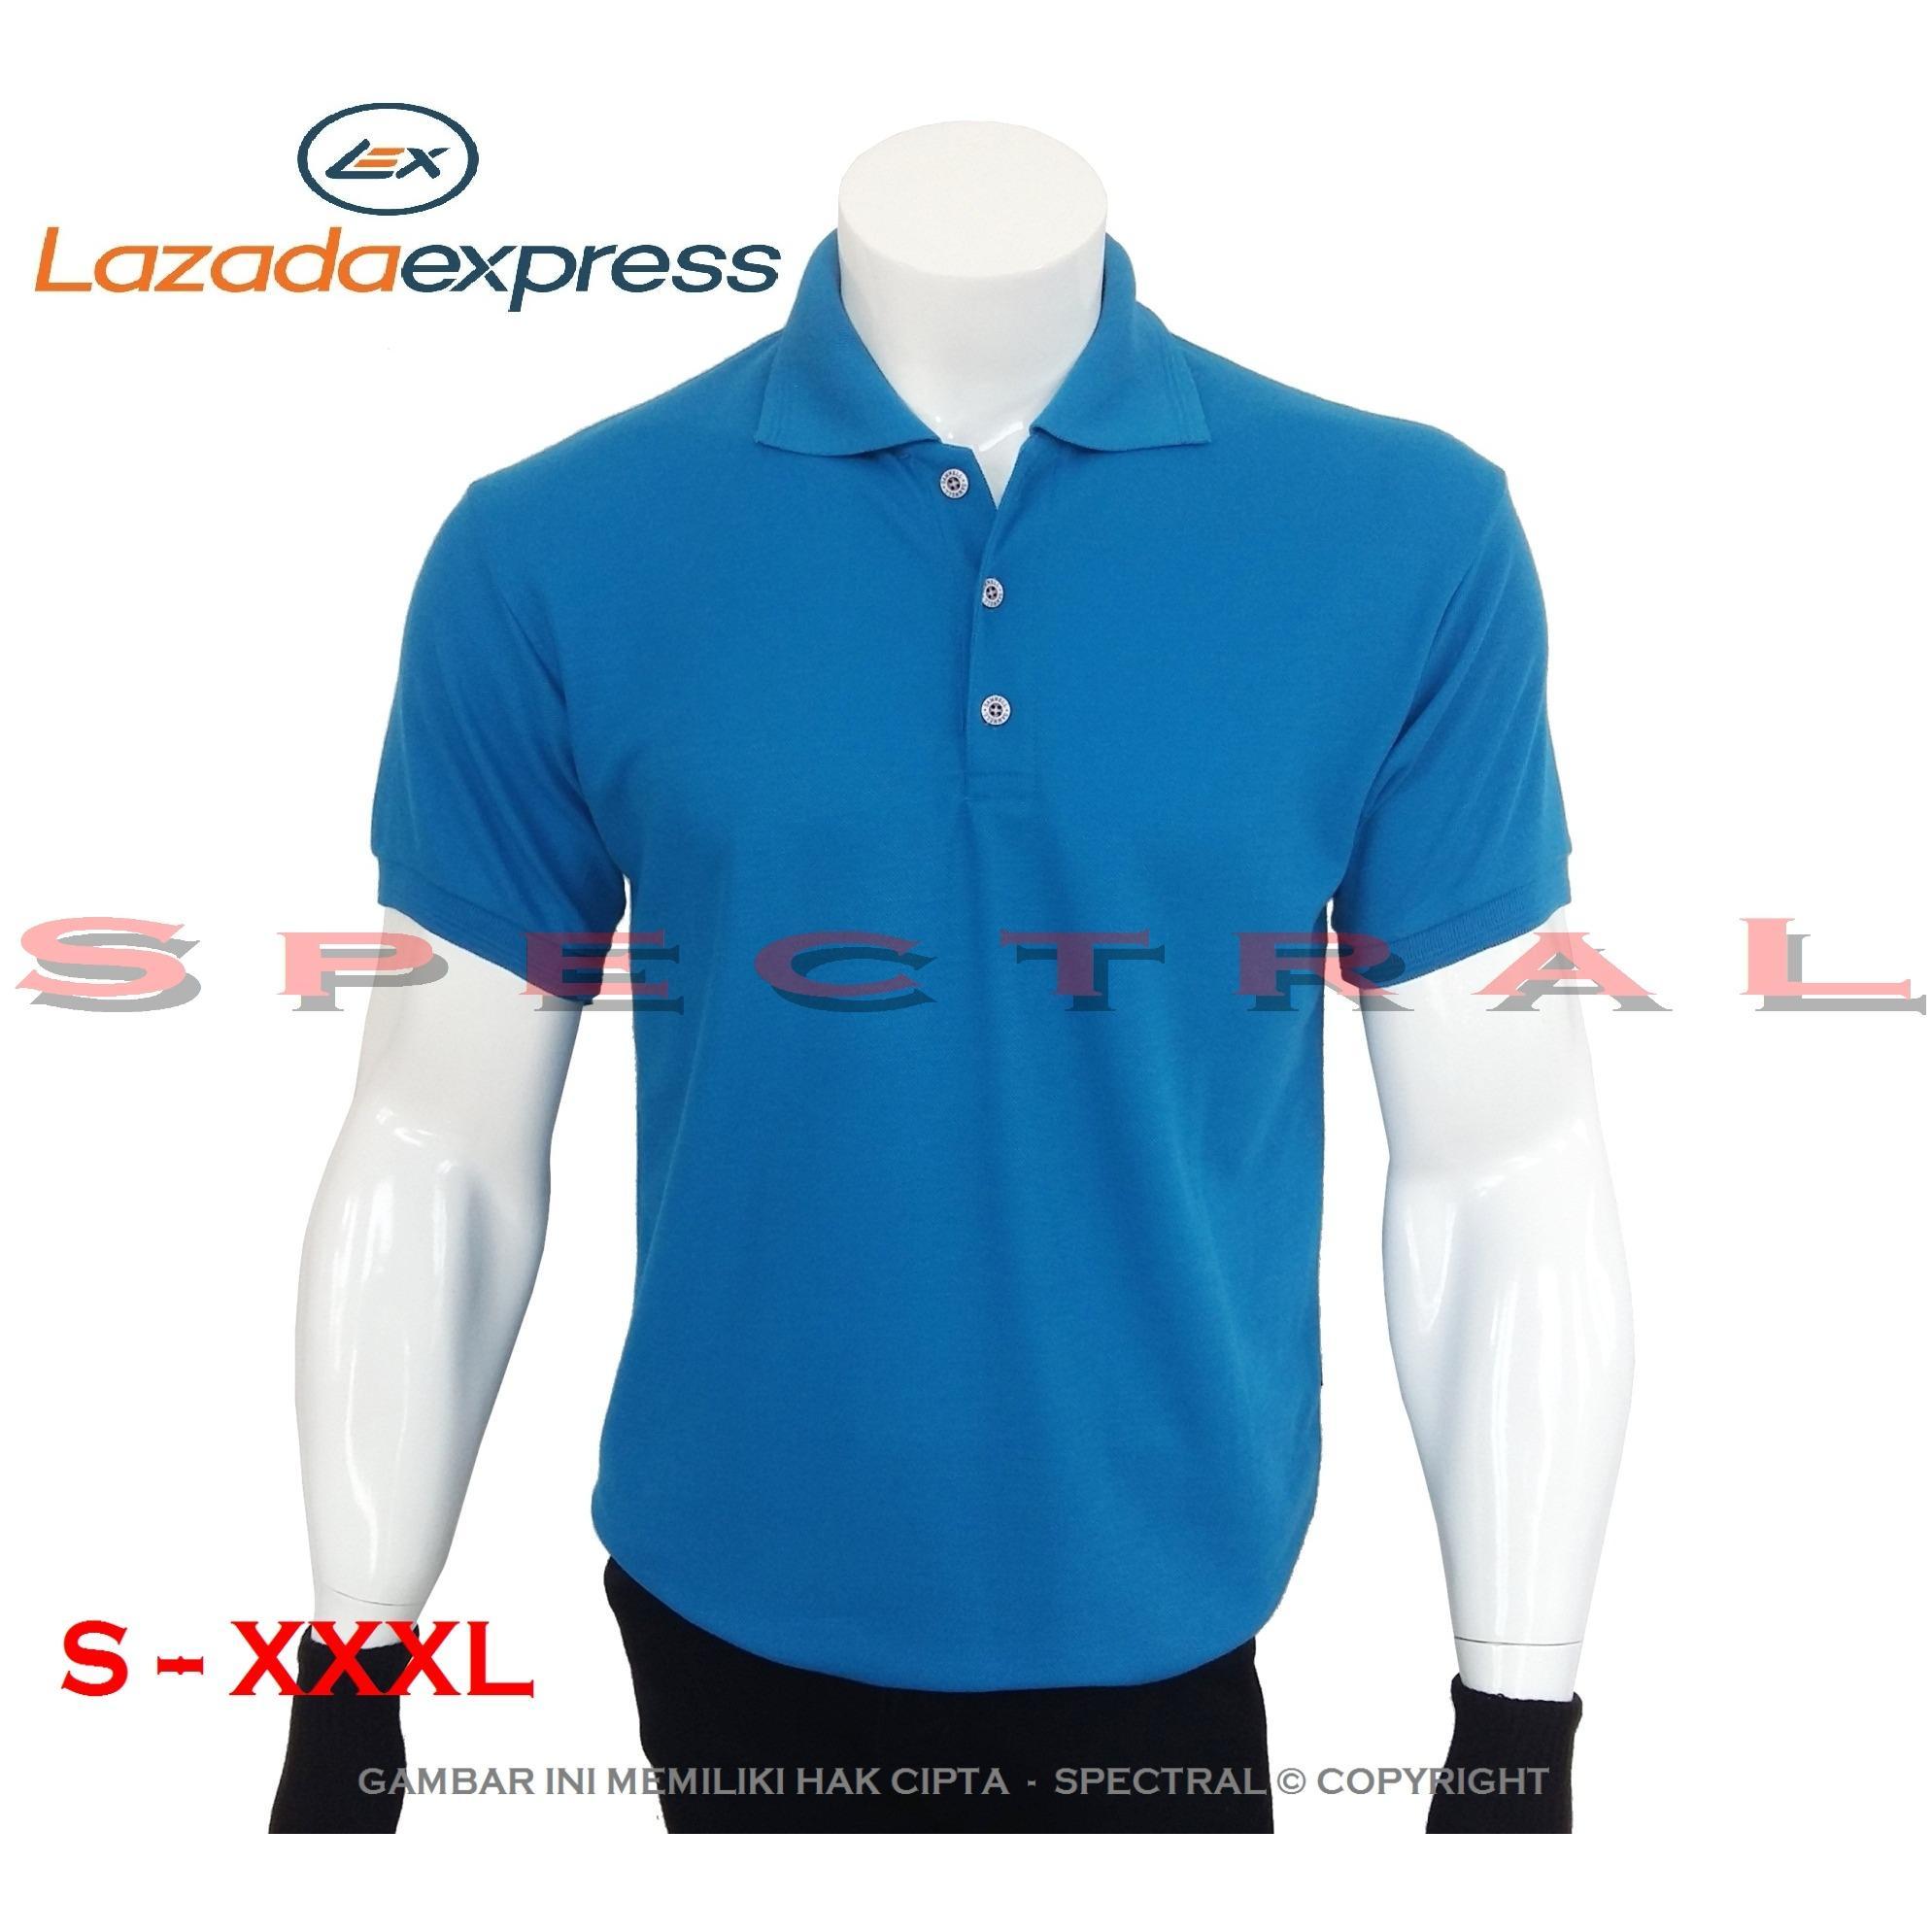 Daftar Harga T Shirt Xl Termurah Jual Brica B Pro White Edition Indonesia Community Size M Spectral 22 Warna S L Xxl Xxxl 2l 3l Polo Kaos Distro